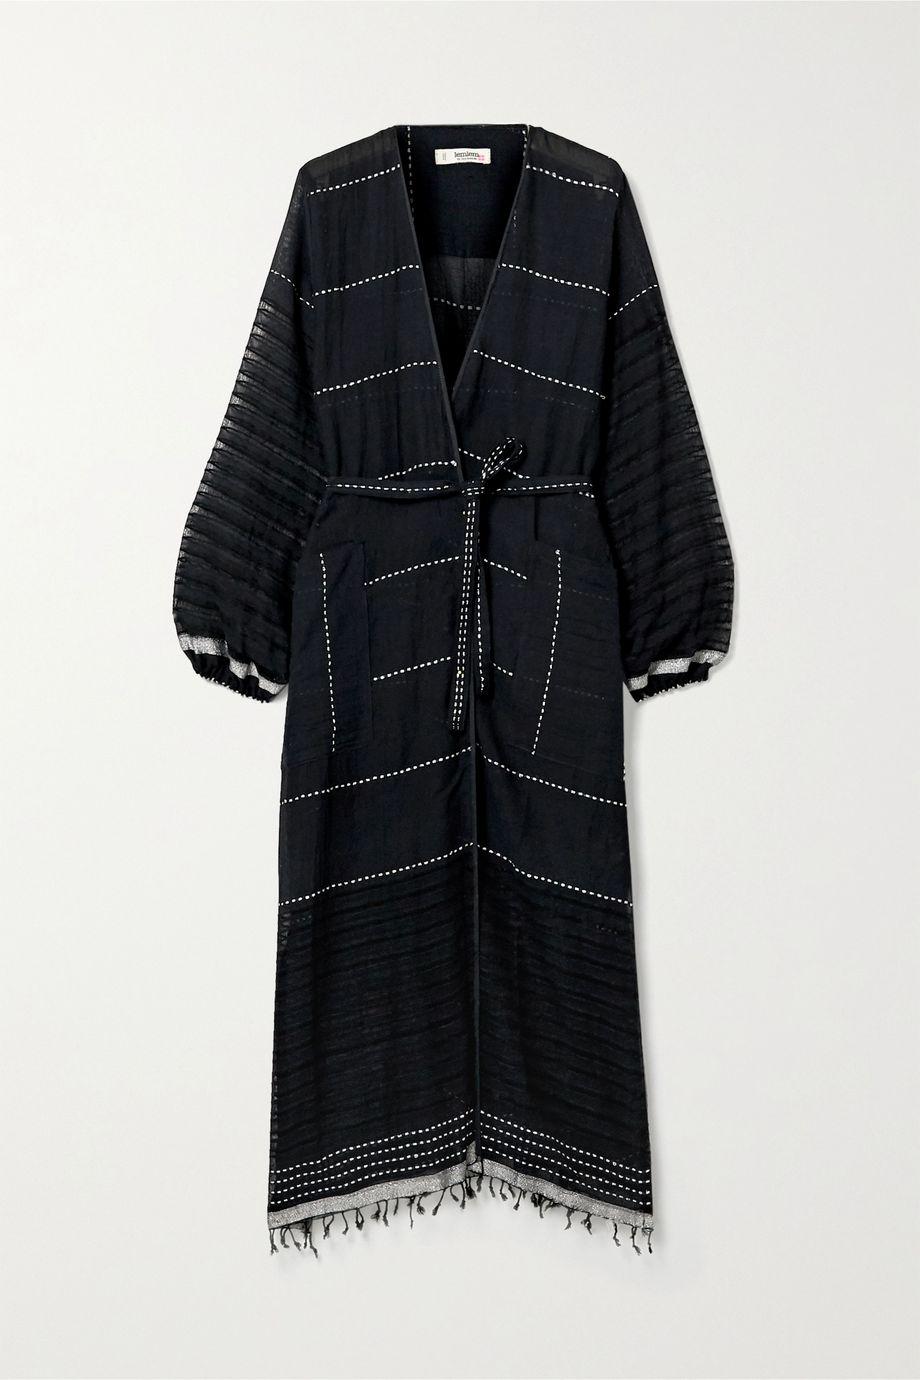 LemLem Tikuri embroidered cotton-voile robe